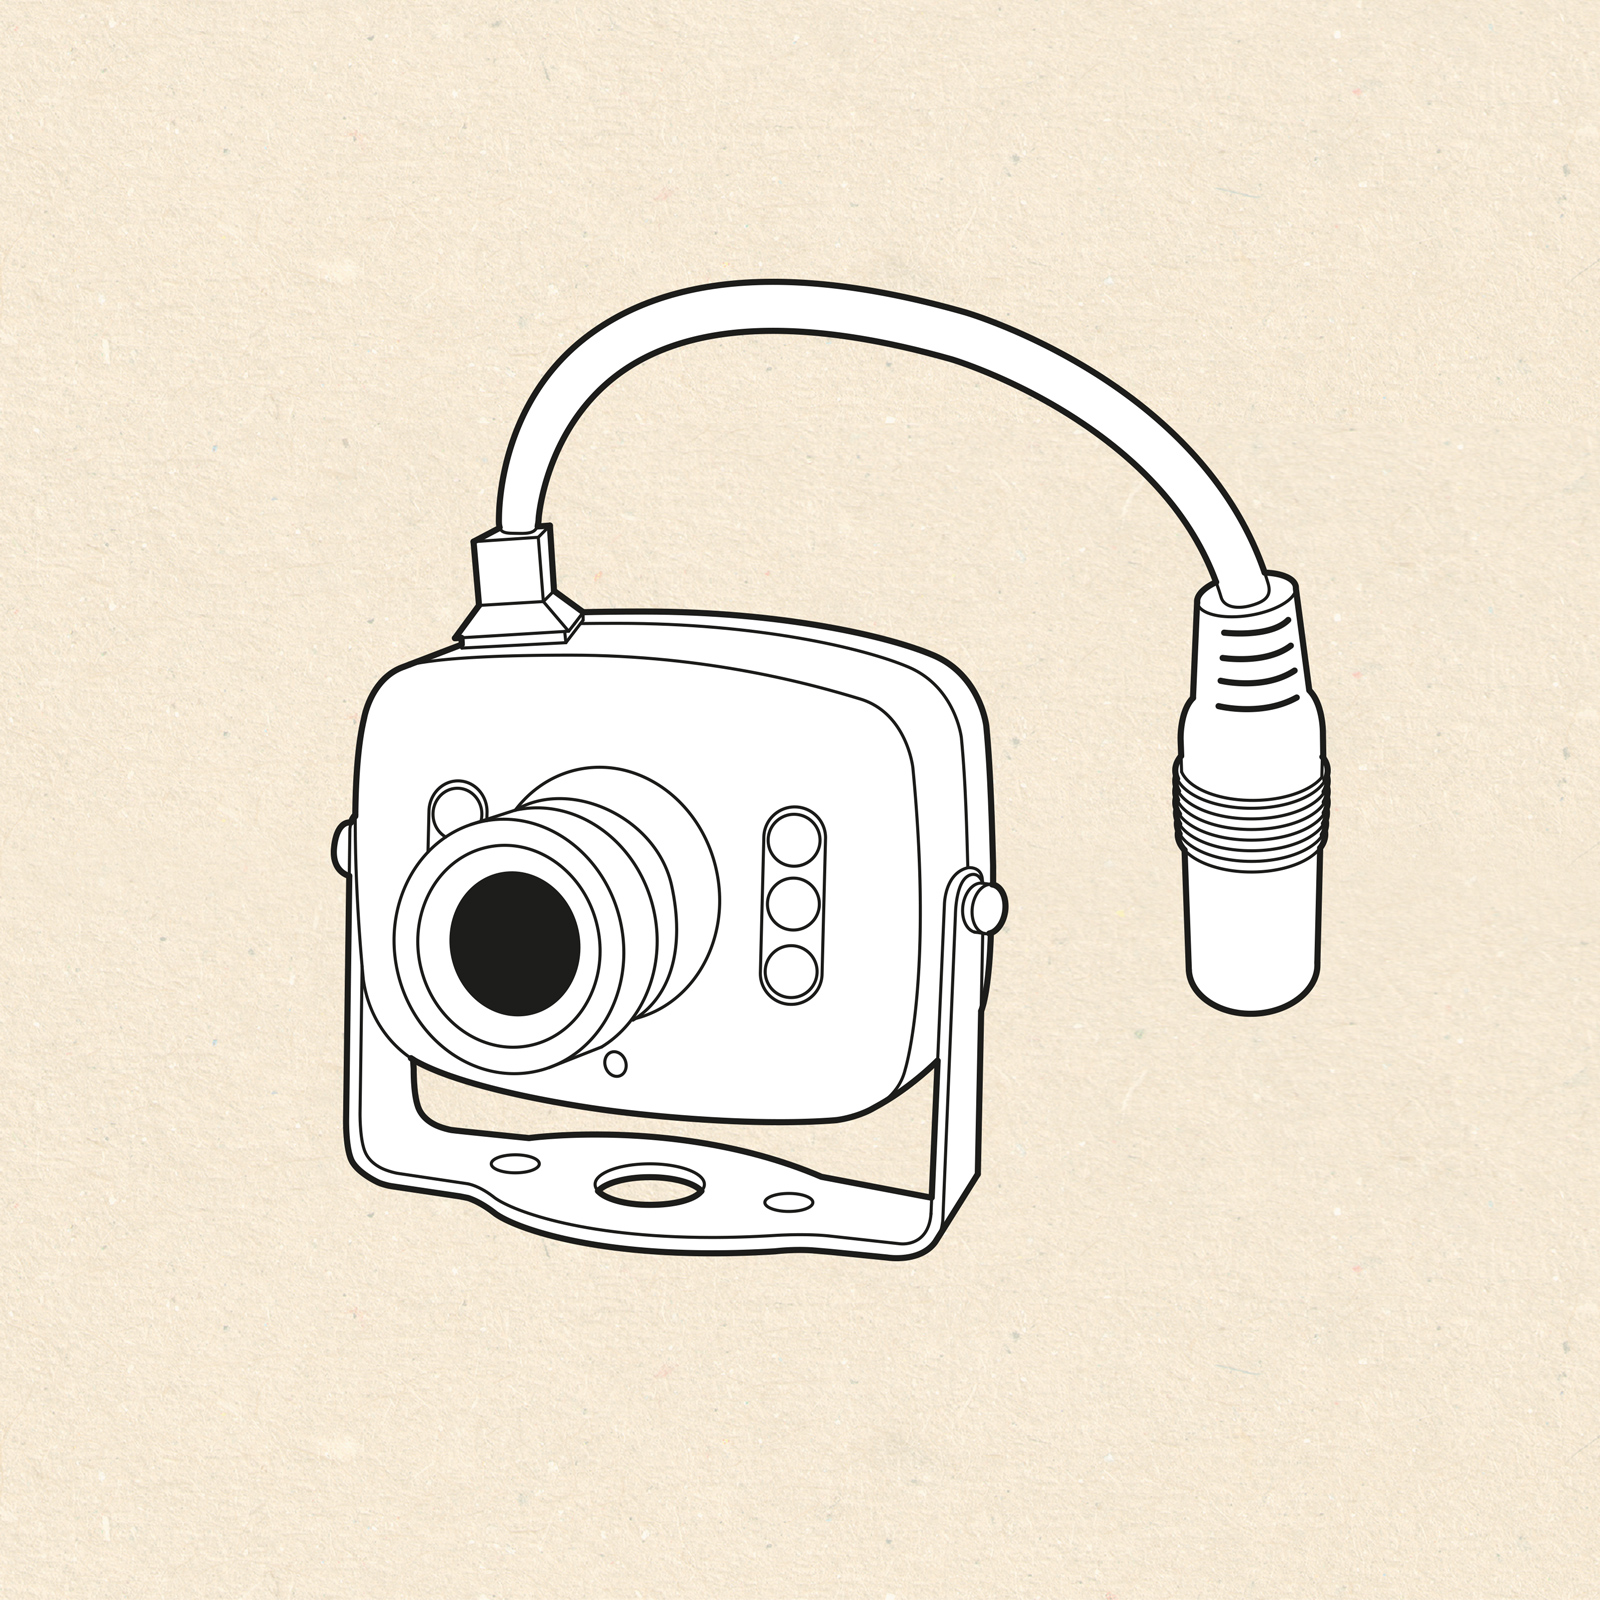 UK Wildlife Cameras Product Illustration